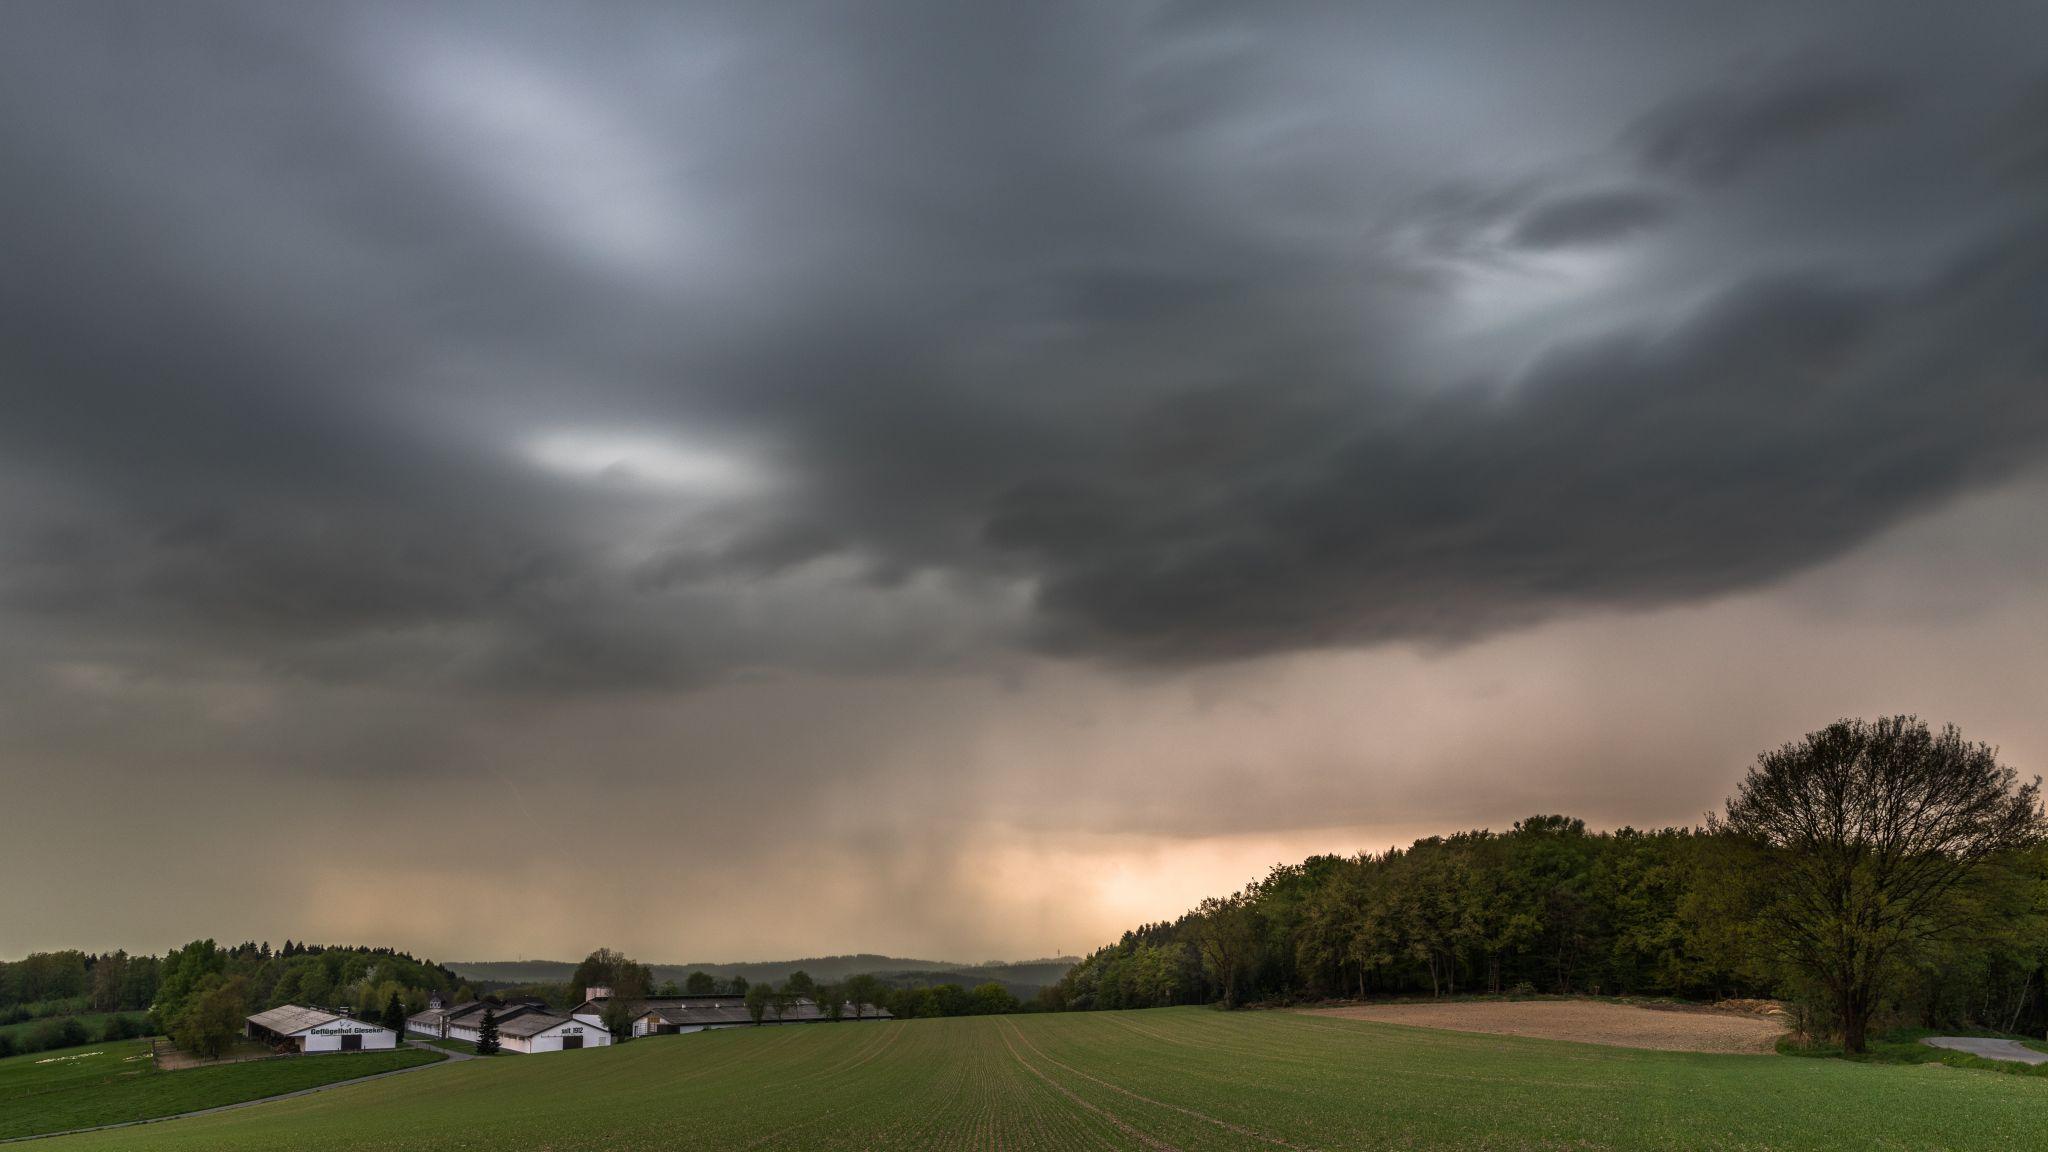 thunderstorm arrives at Kreisch, Sauerland, Germany